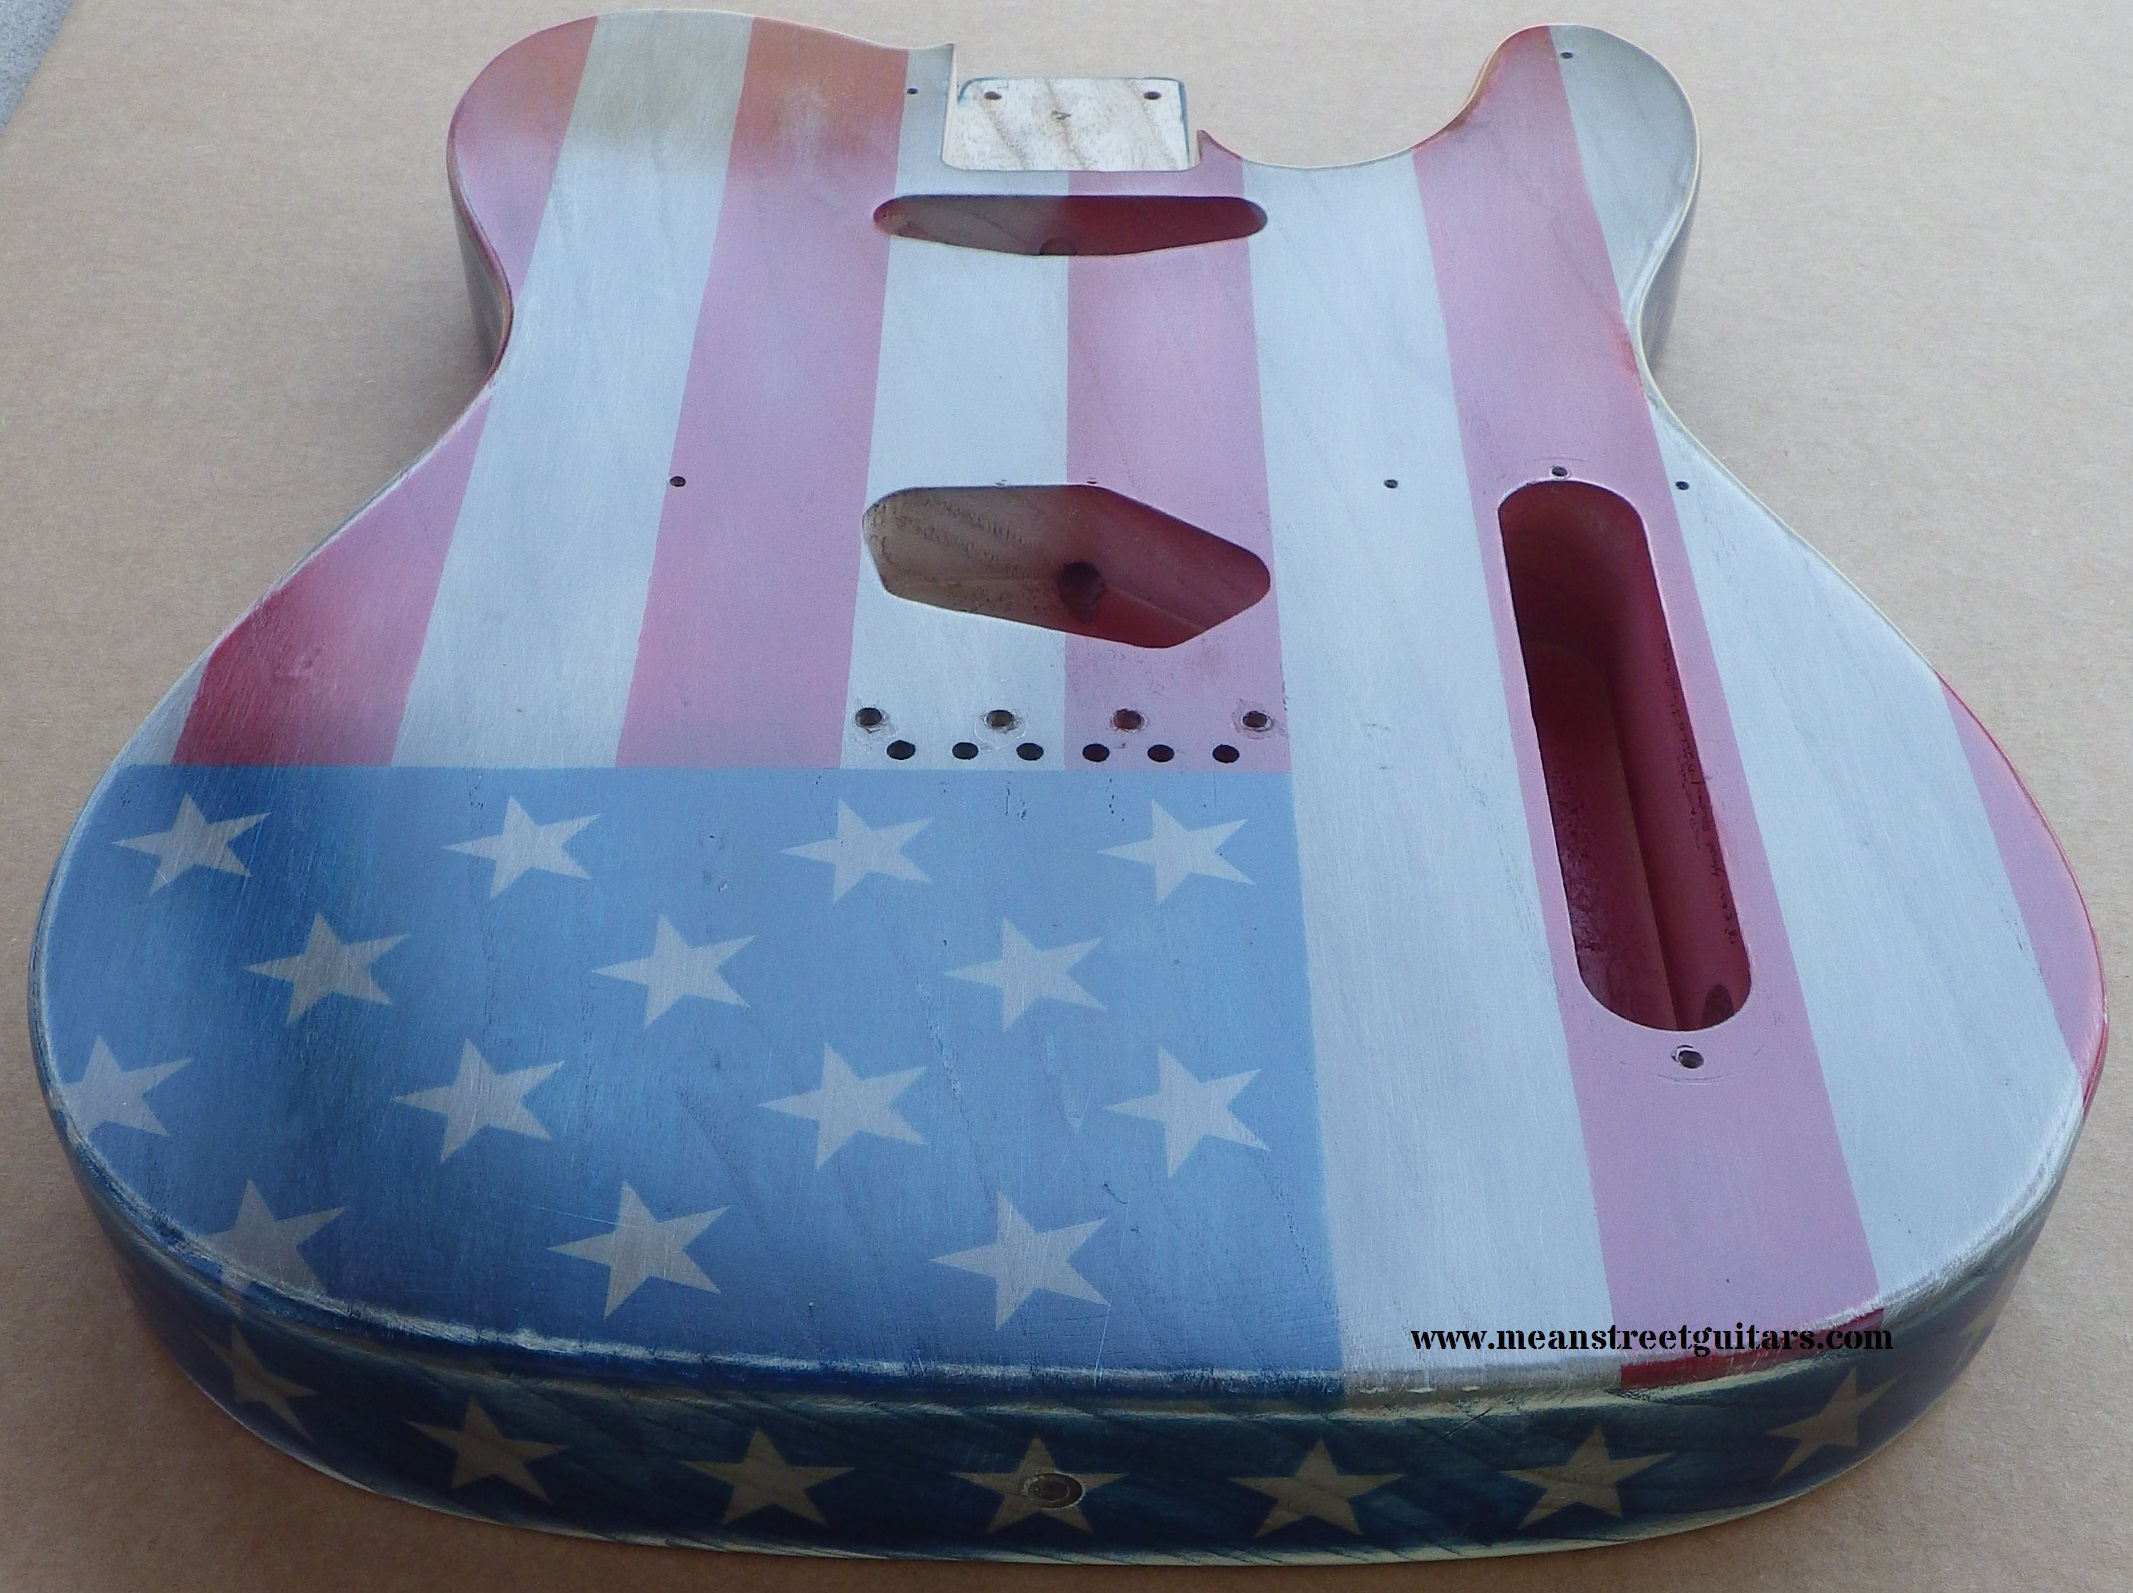 Mean Street American Flag Tele relic paint job Shawne P pic 5.jpg